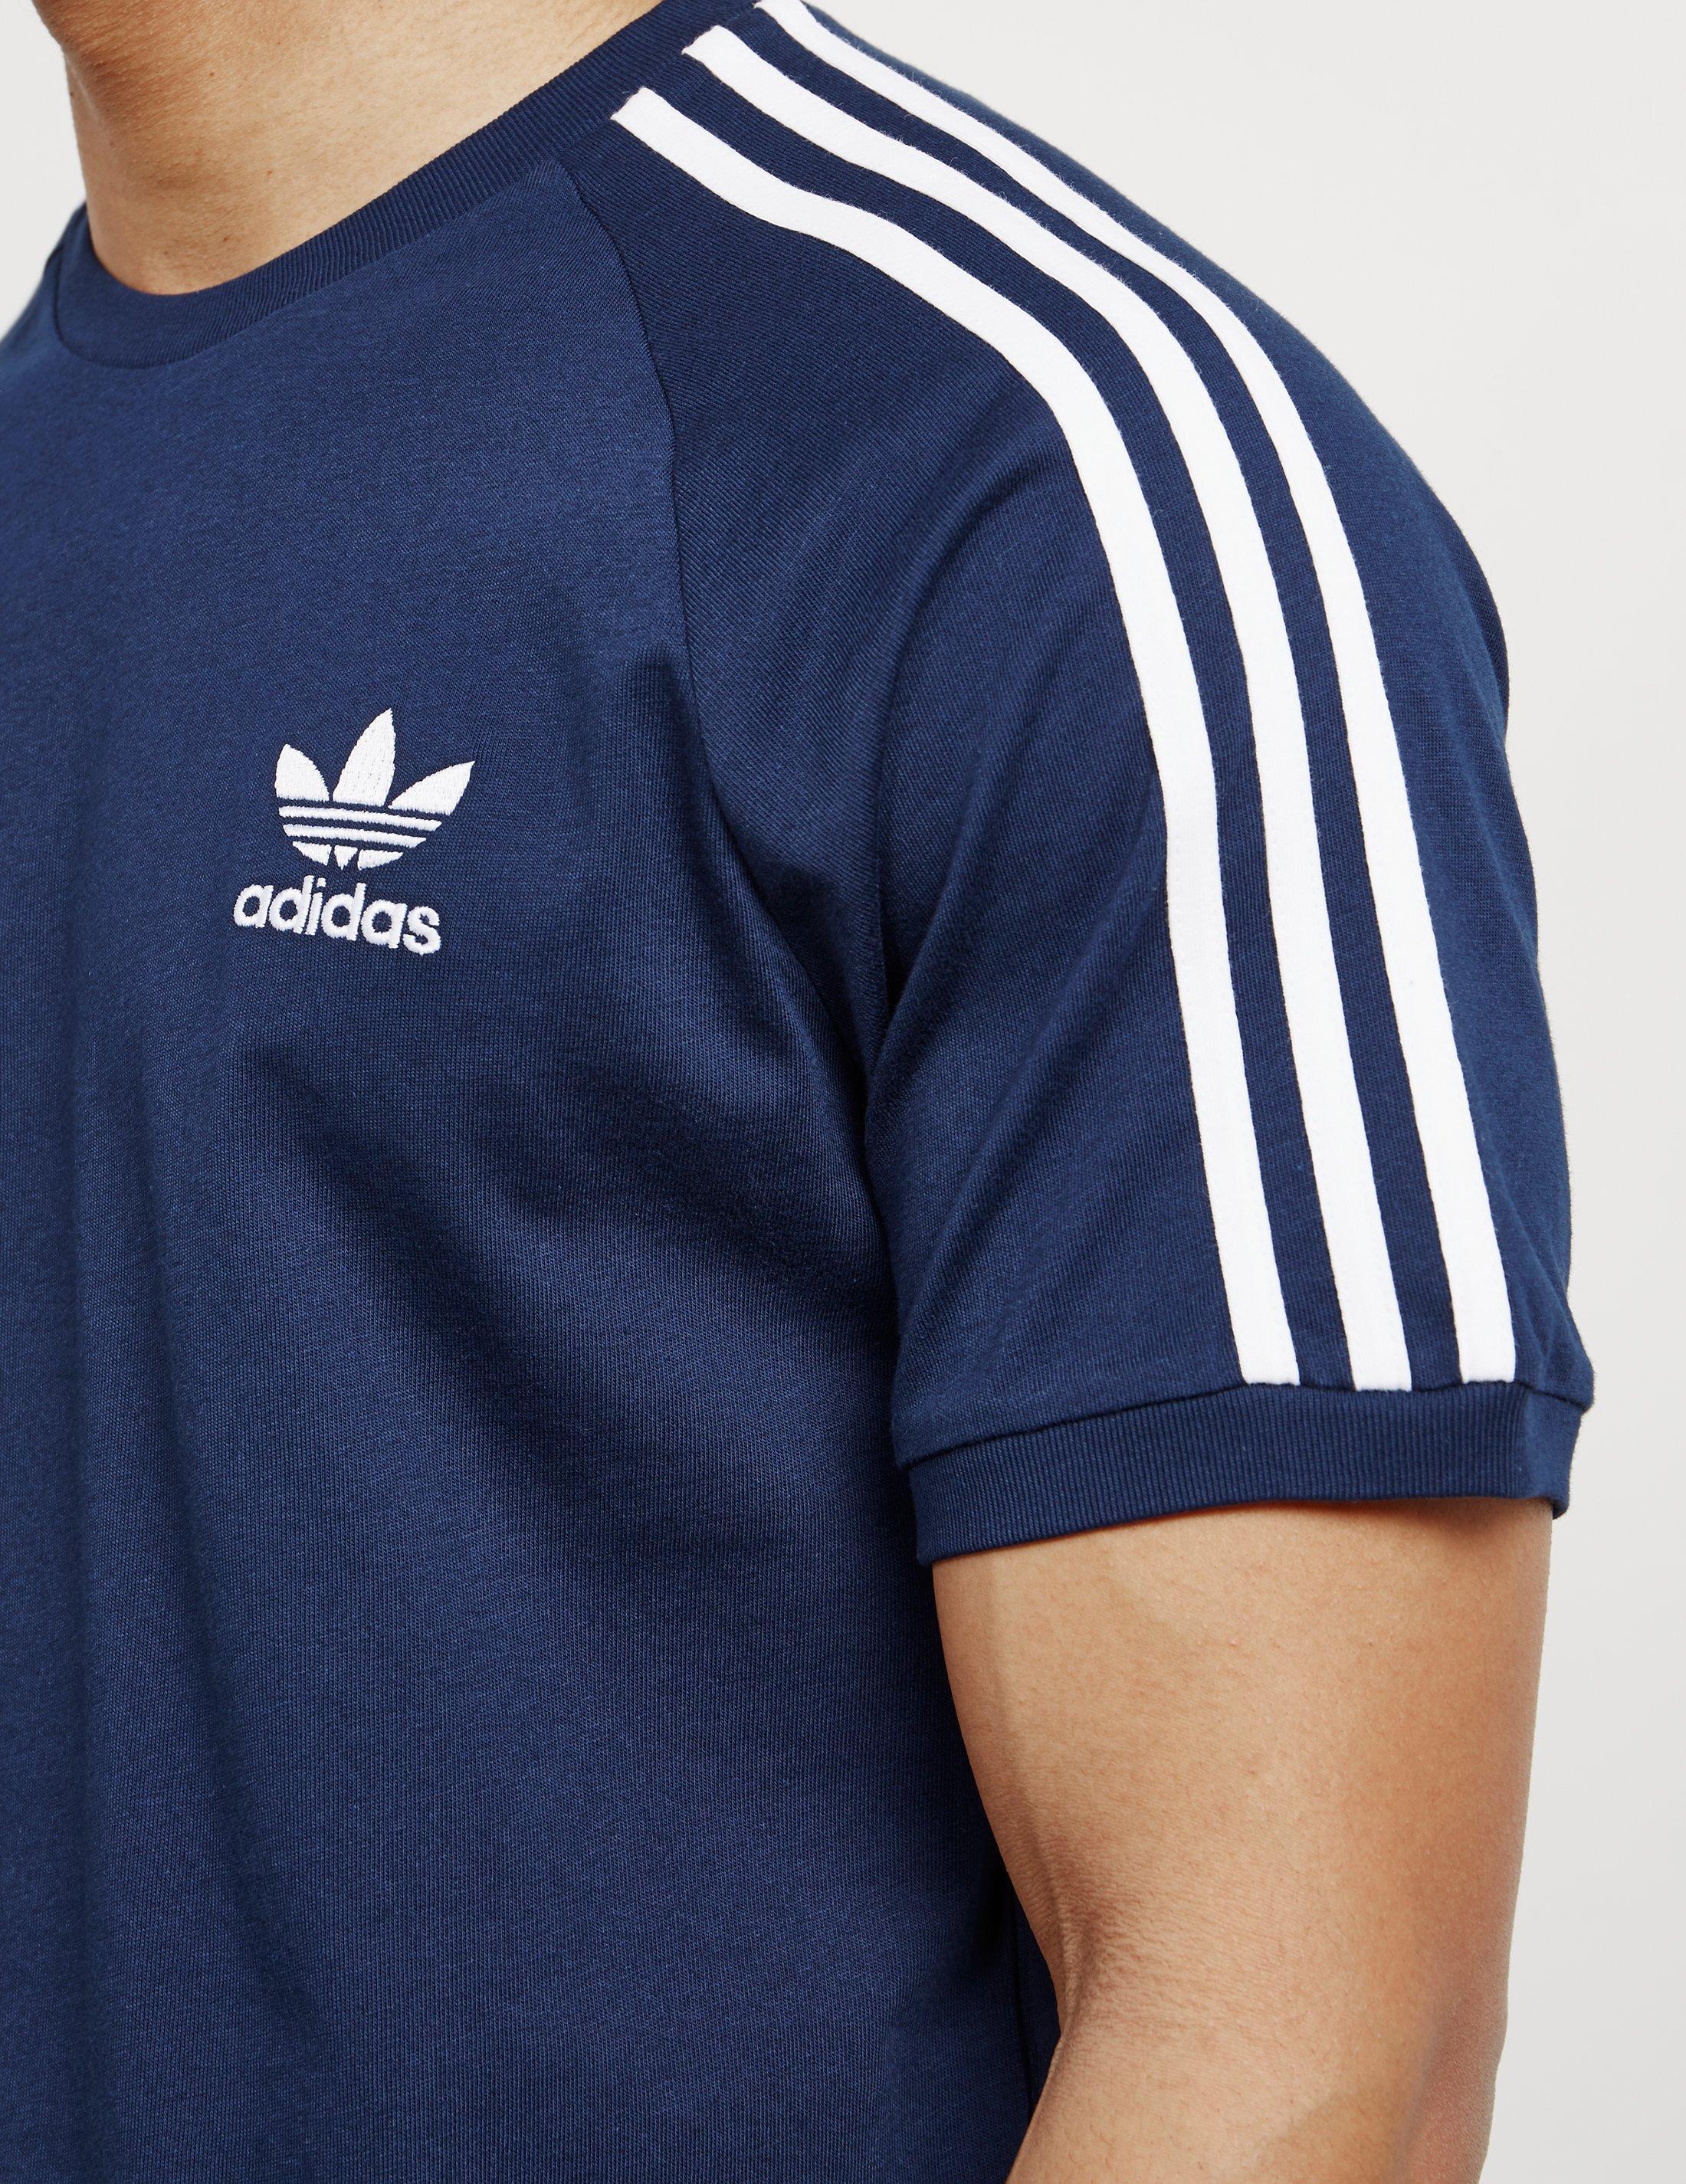 adidas shirt navy blue